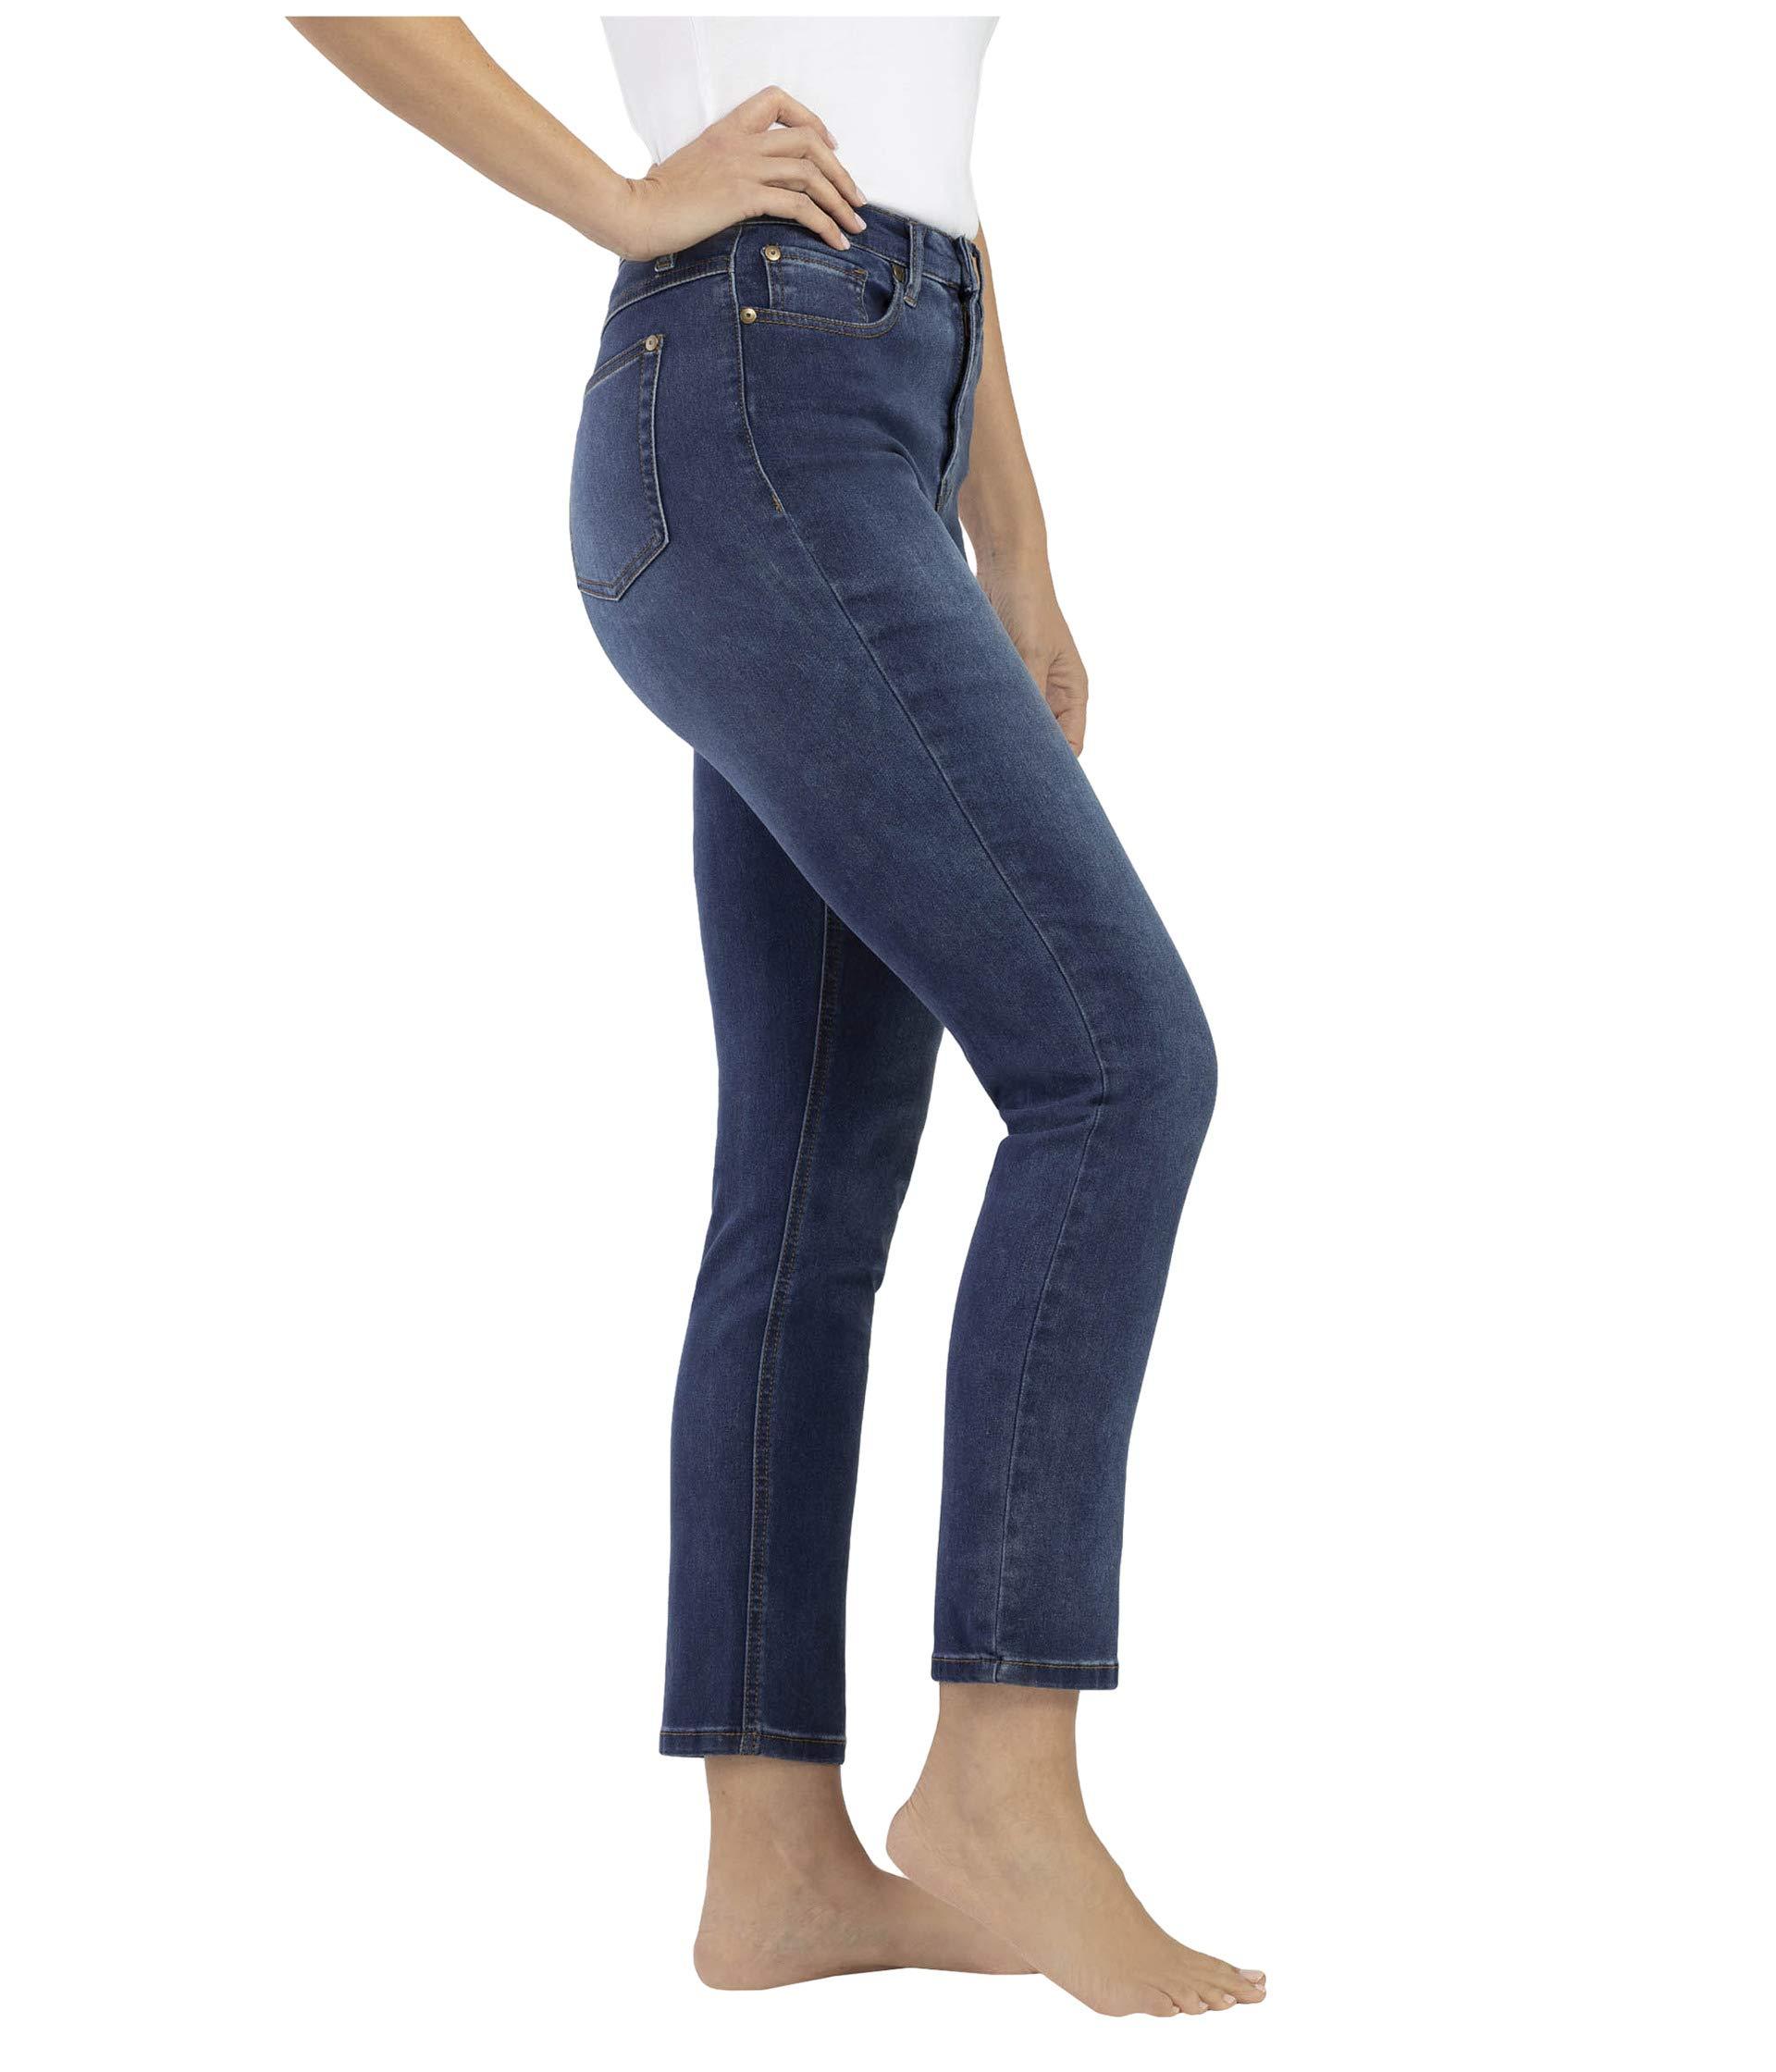 Ropa Pantalones De Mezclilla Tribal Five Pocket High Rise Slim In Retro Blue Retro Blue